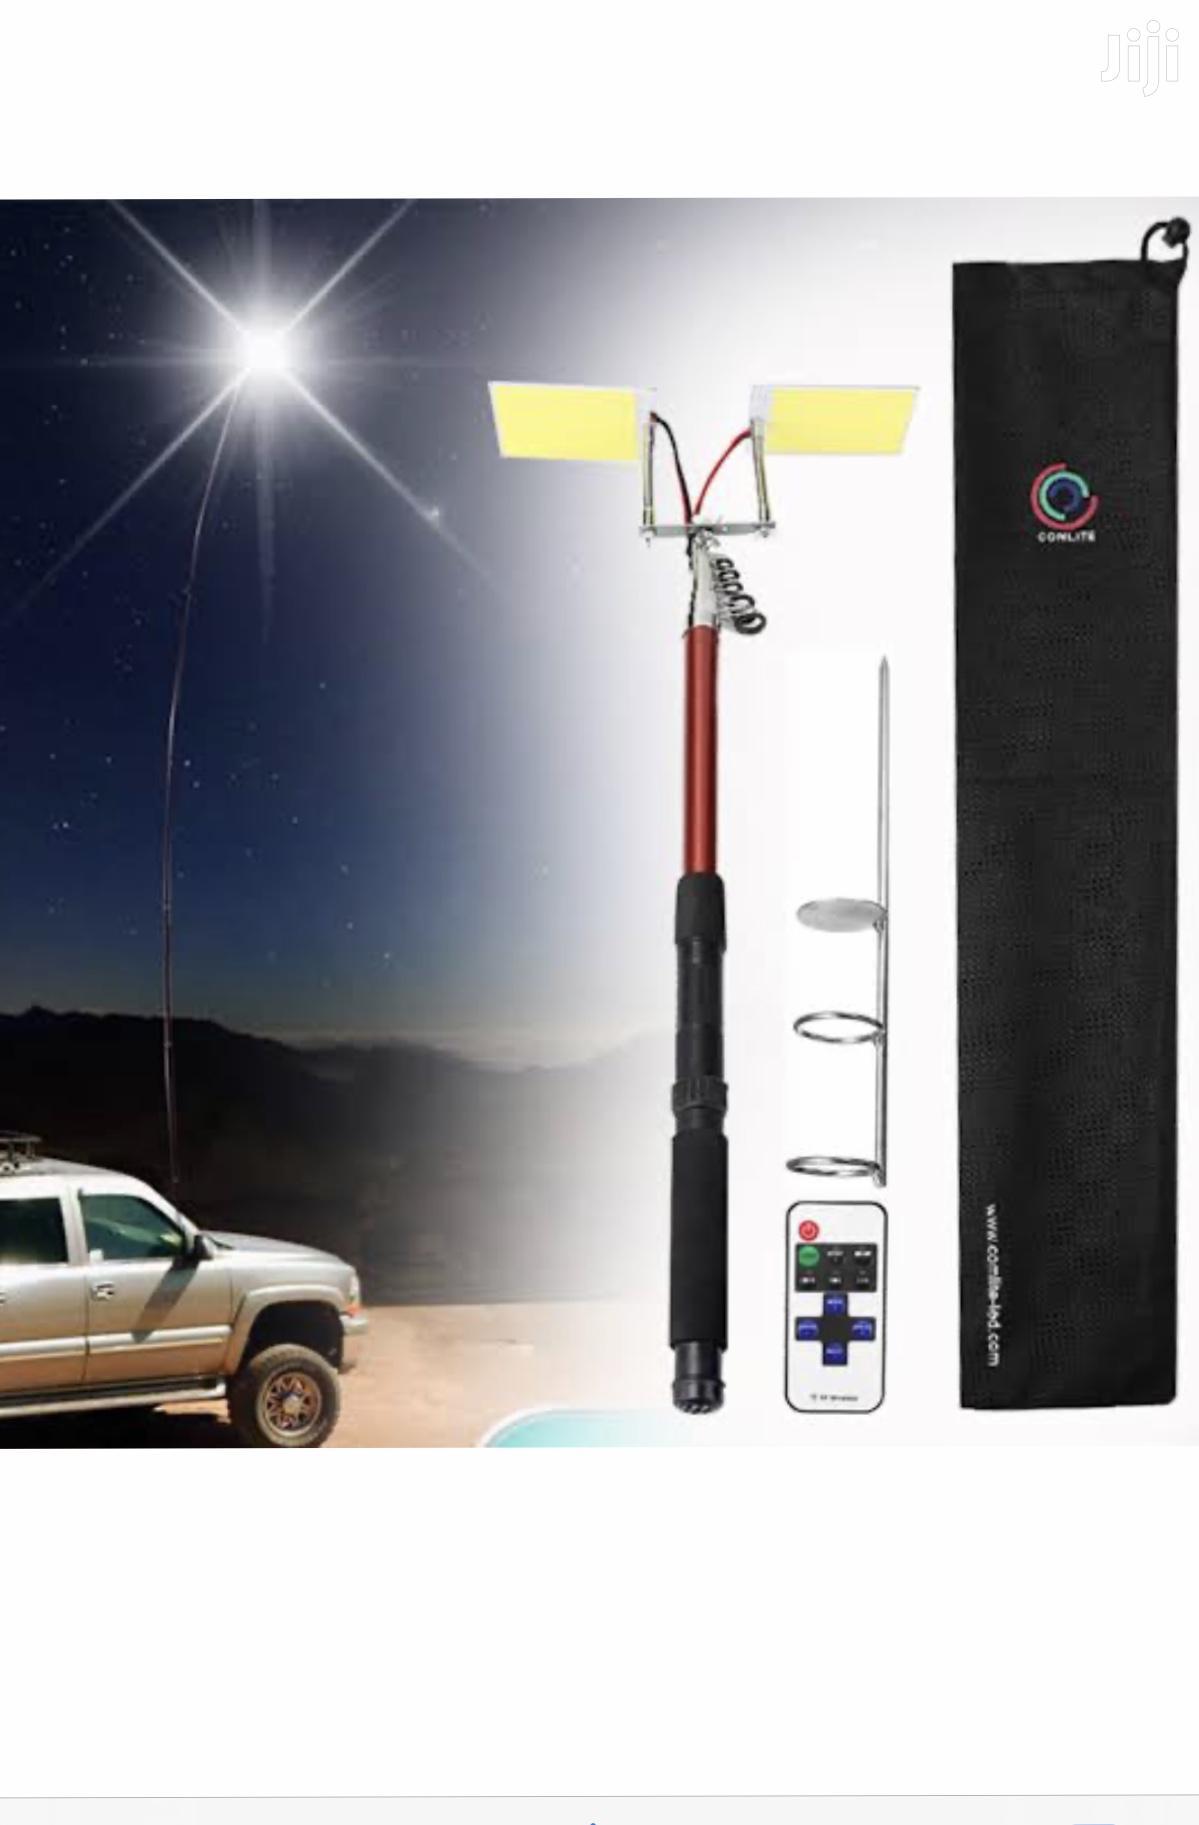 Telescopic Rod 4m Led Lights Fishing Camping Rod